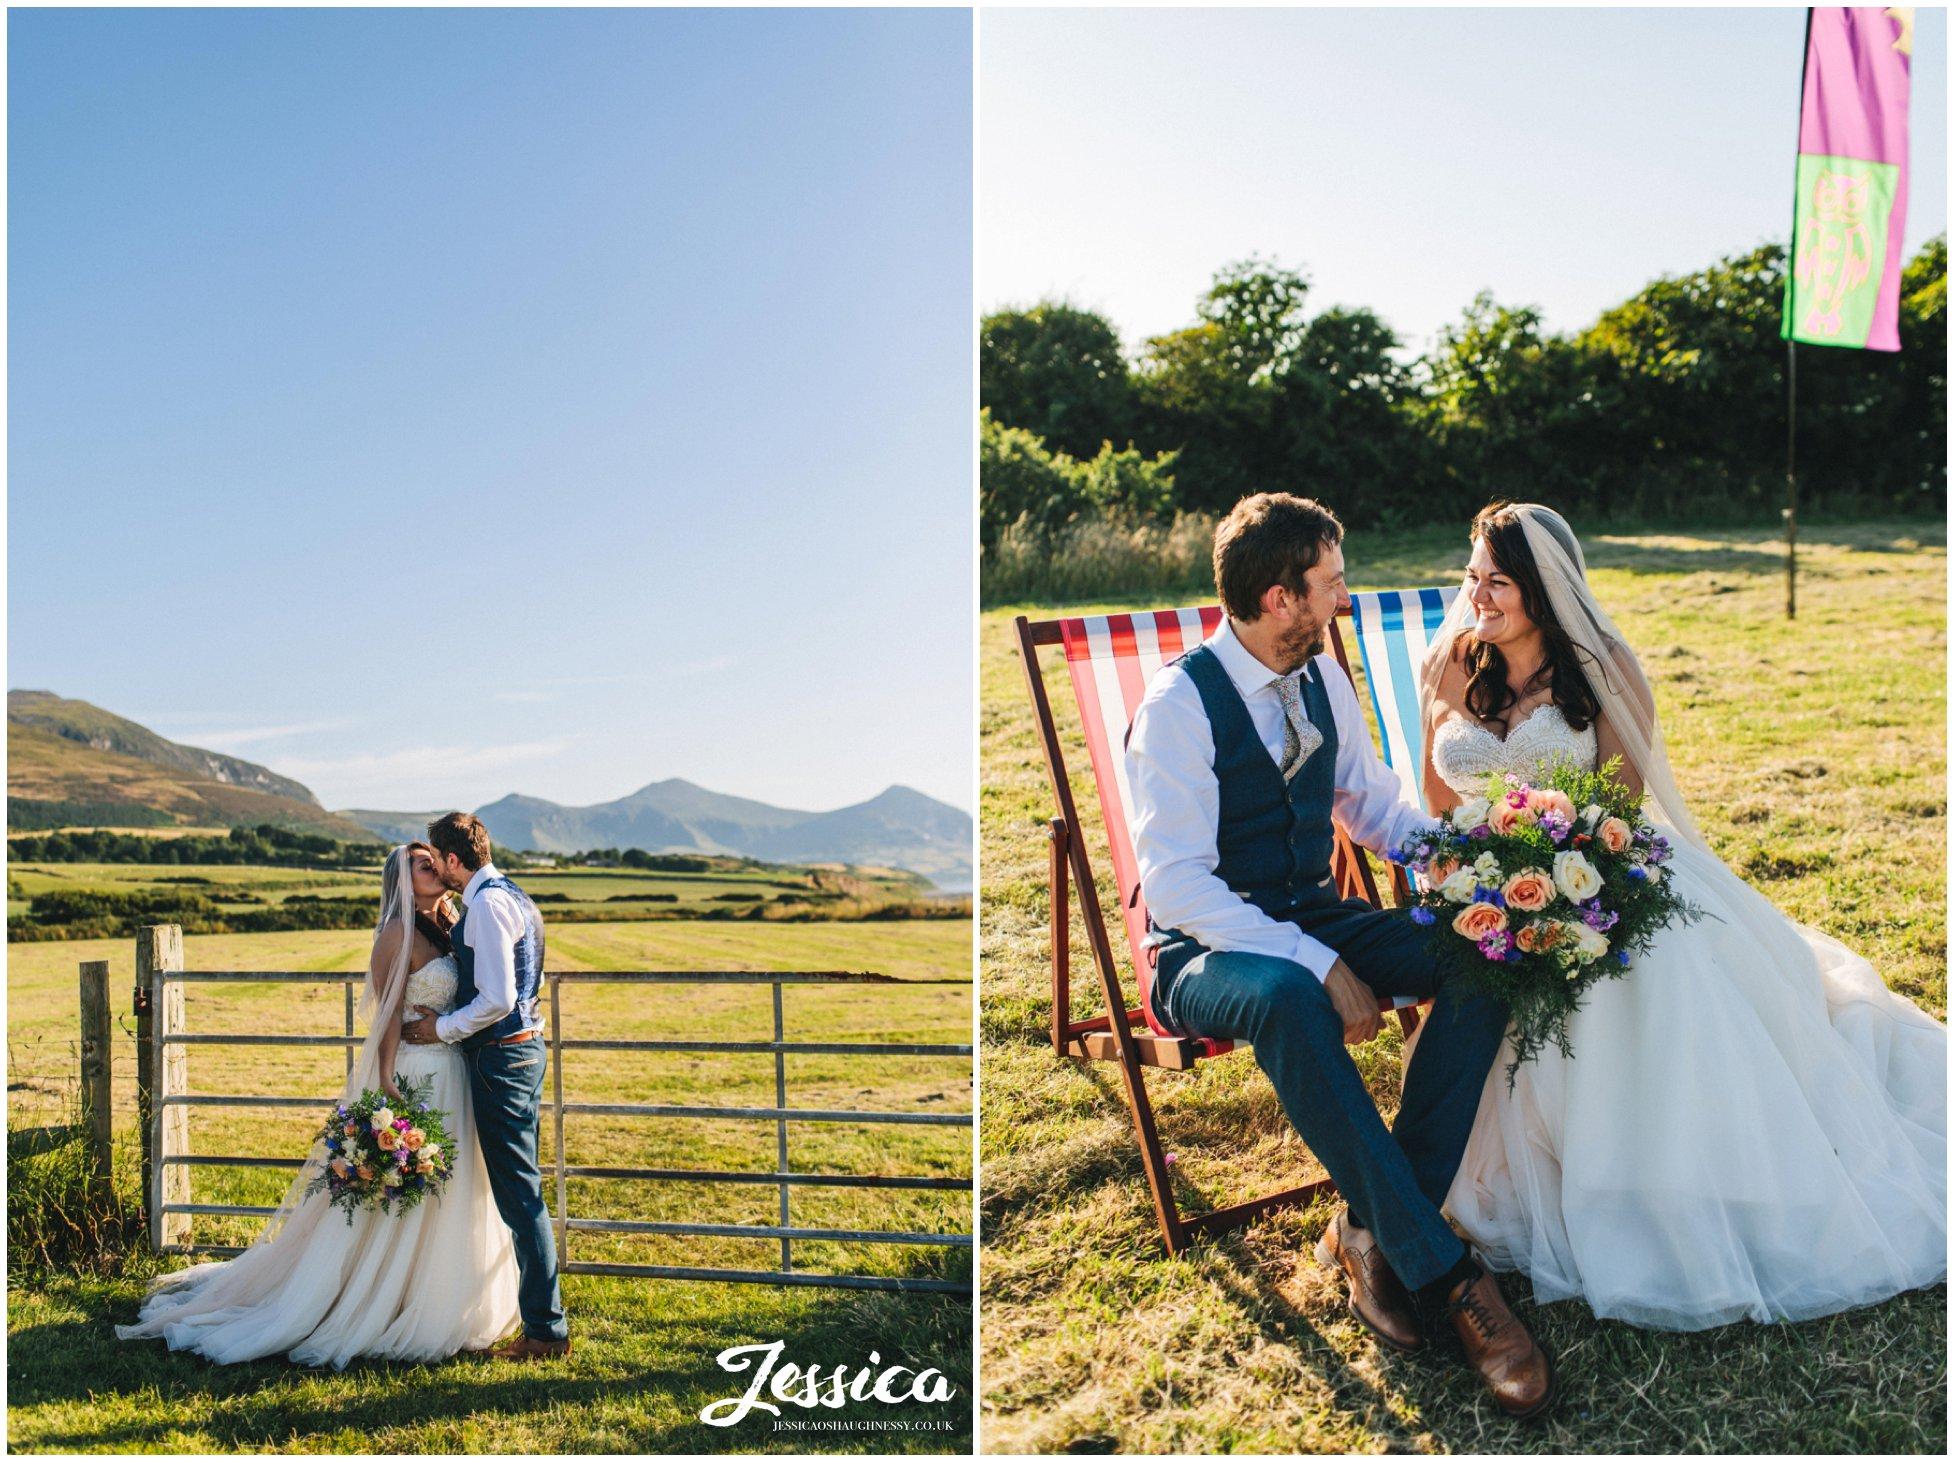 the new couple enjoy the sun at their north wales wedding in Caernarfon